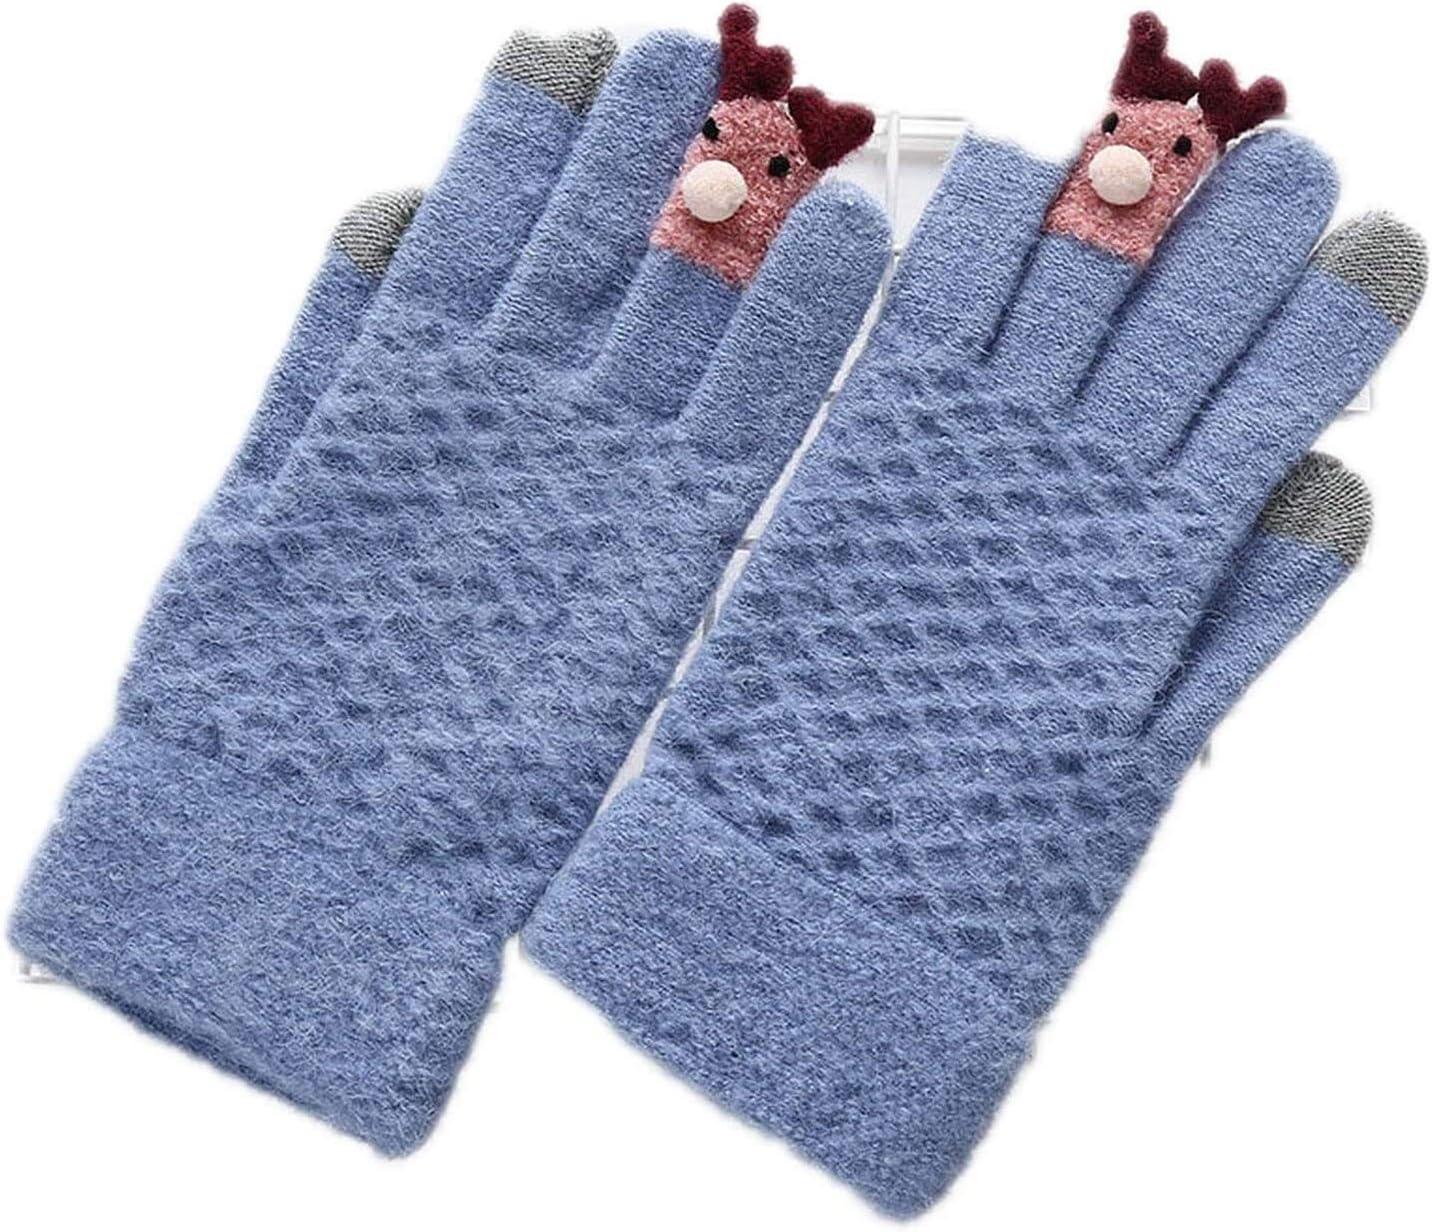 Samantha Warm Gloves Ladies Winter Warm Cute Cartoon Finger Knit Touch Screen Gloves Women Full Finger Soft Mittens Black Gloves (Color : F Sky Blue, Size : Oneszie)